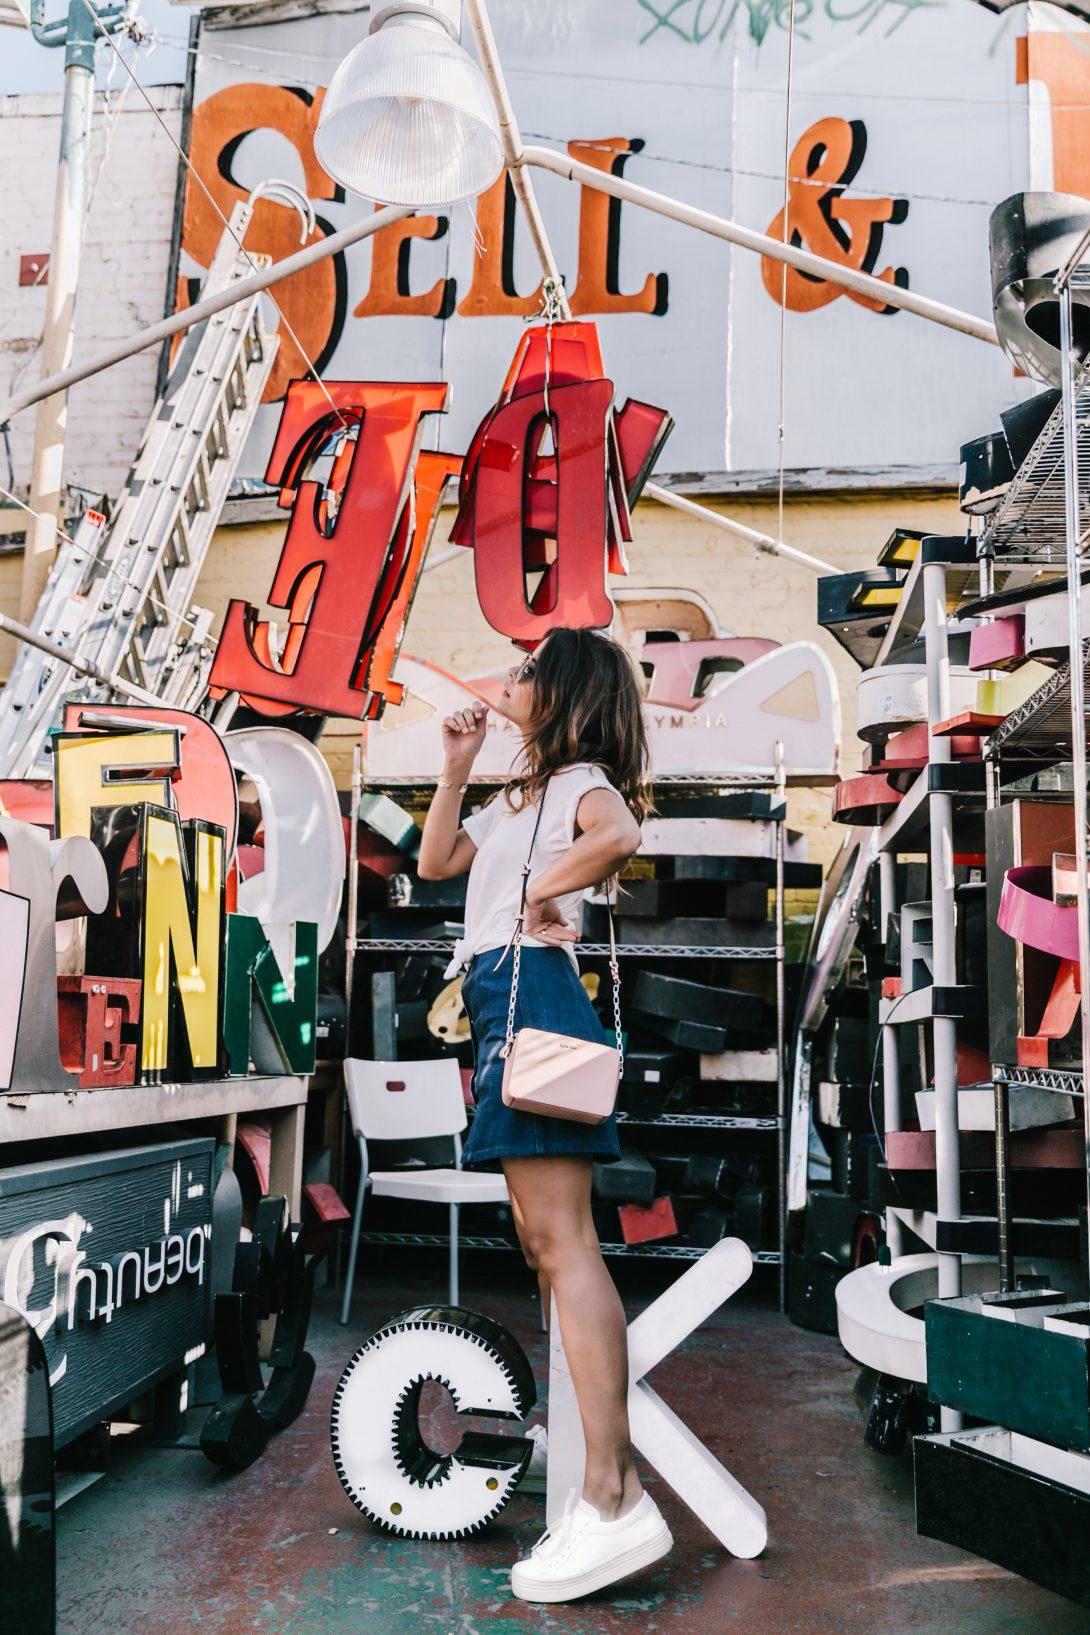 Calvin_Klein-Denim_Skirt-CK_Collection-Los_Angeles-Nick_Metropolis-Saint_Laurent_Sneakers-Pink_Bag-Outfit-Collage_Vintage-39-1090x1635.jpg